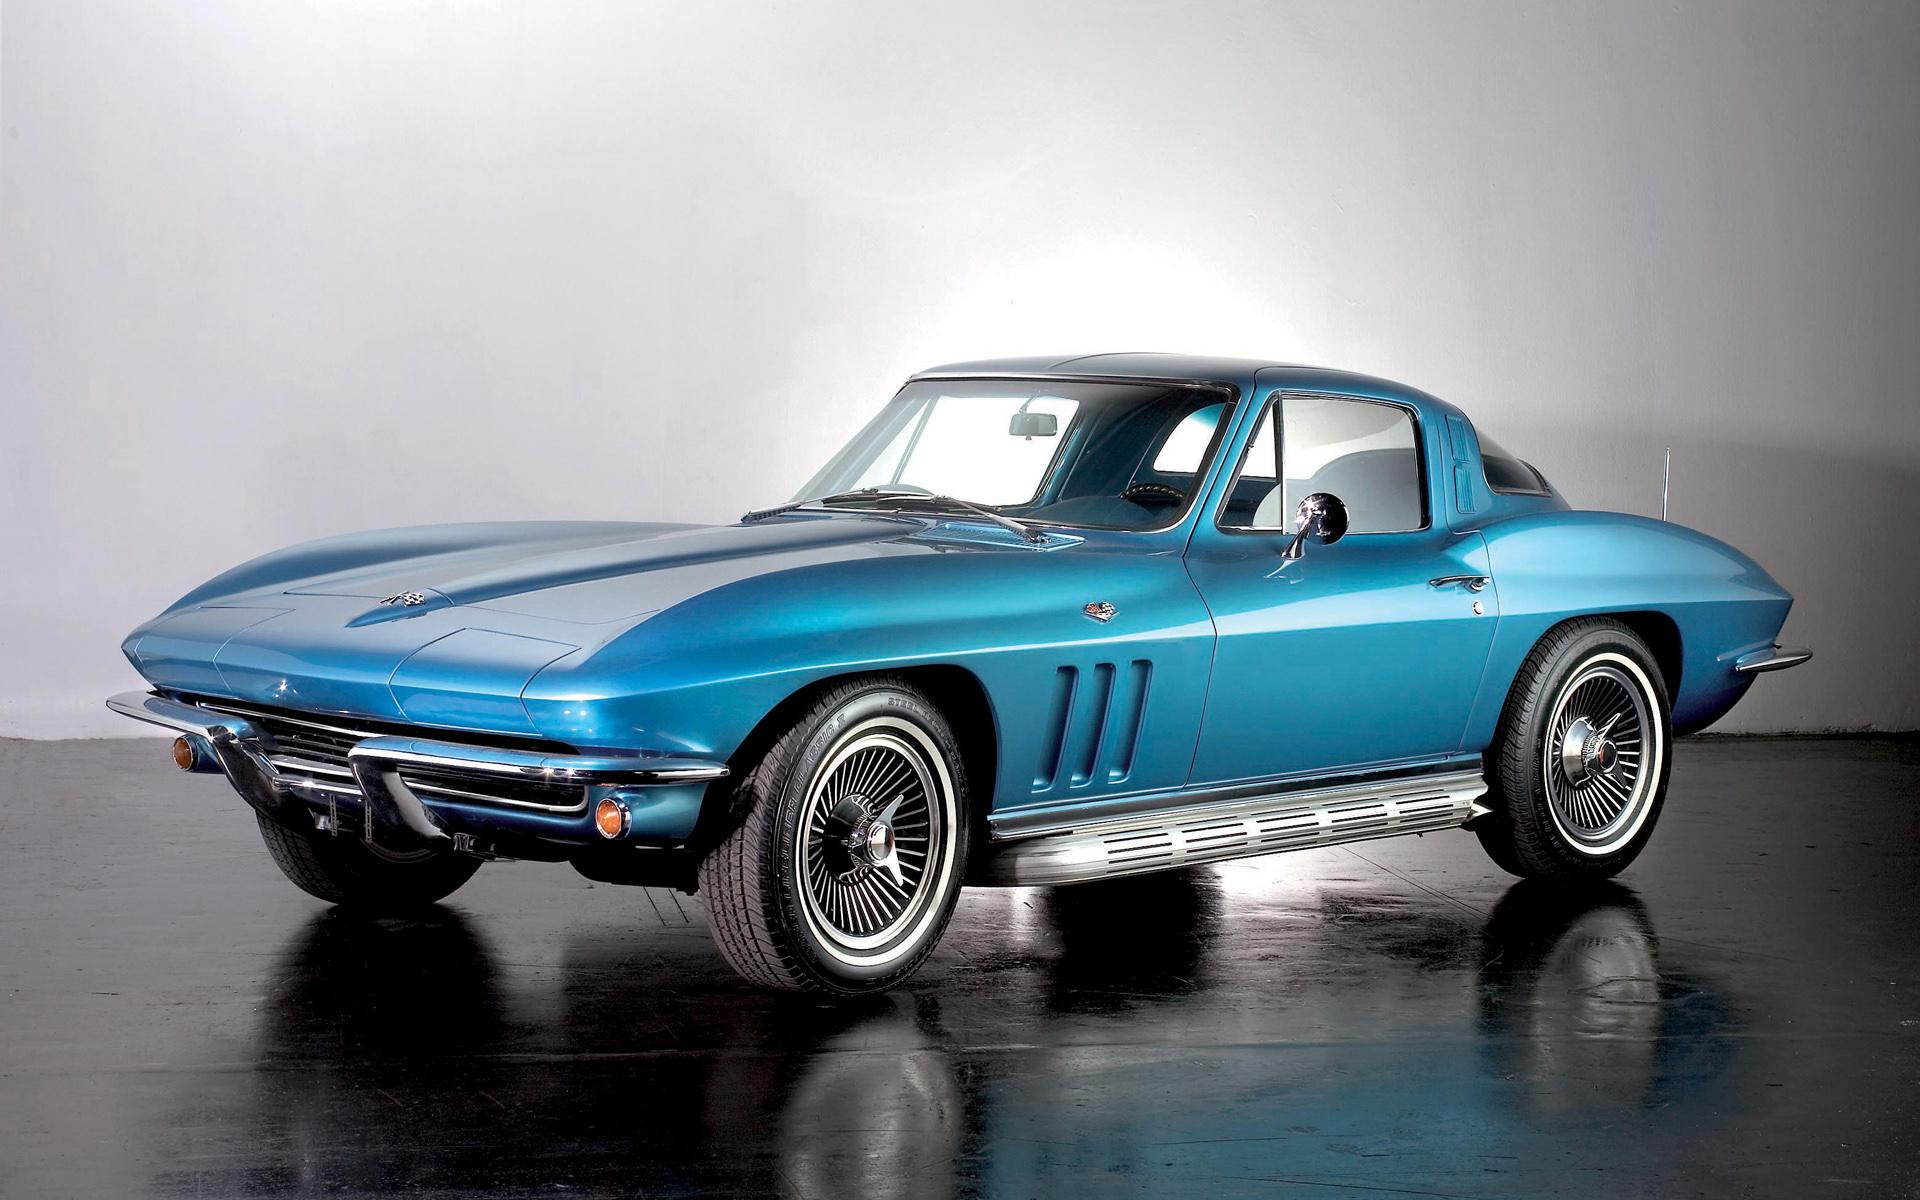 The C2 Corvette